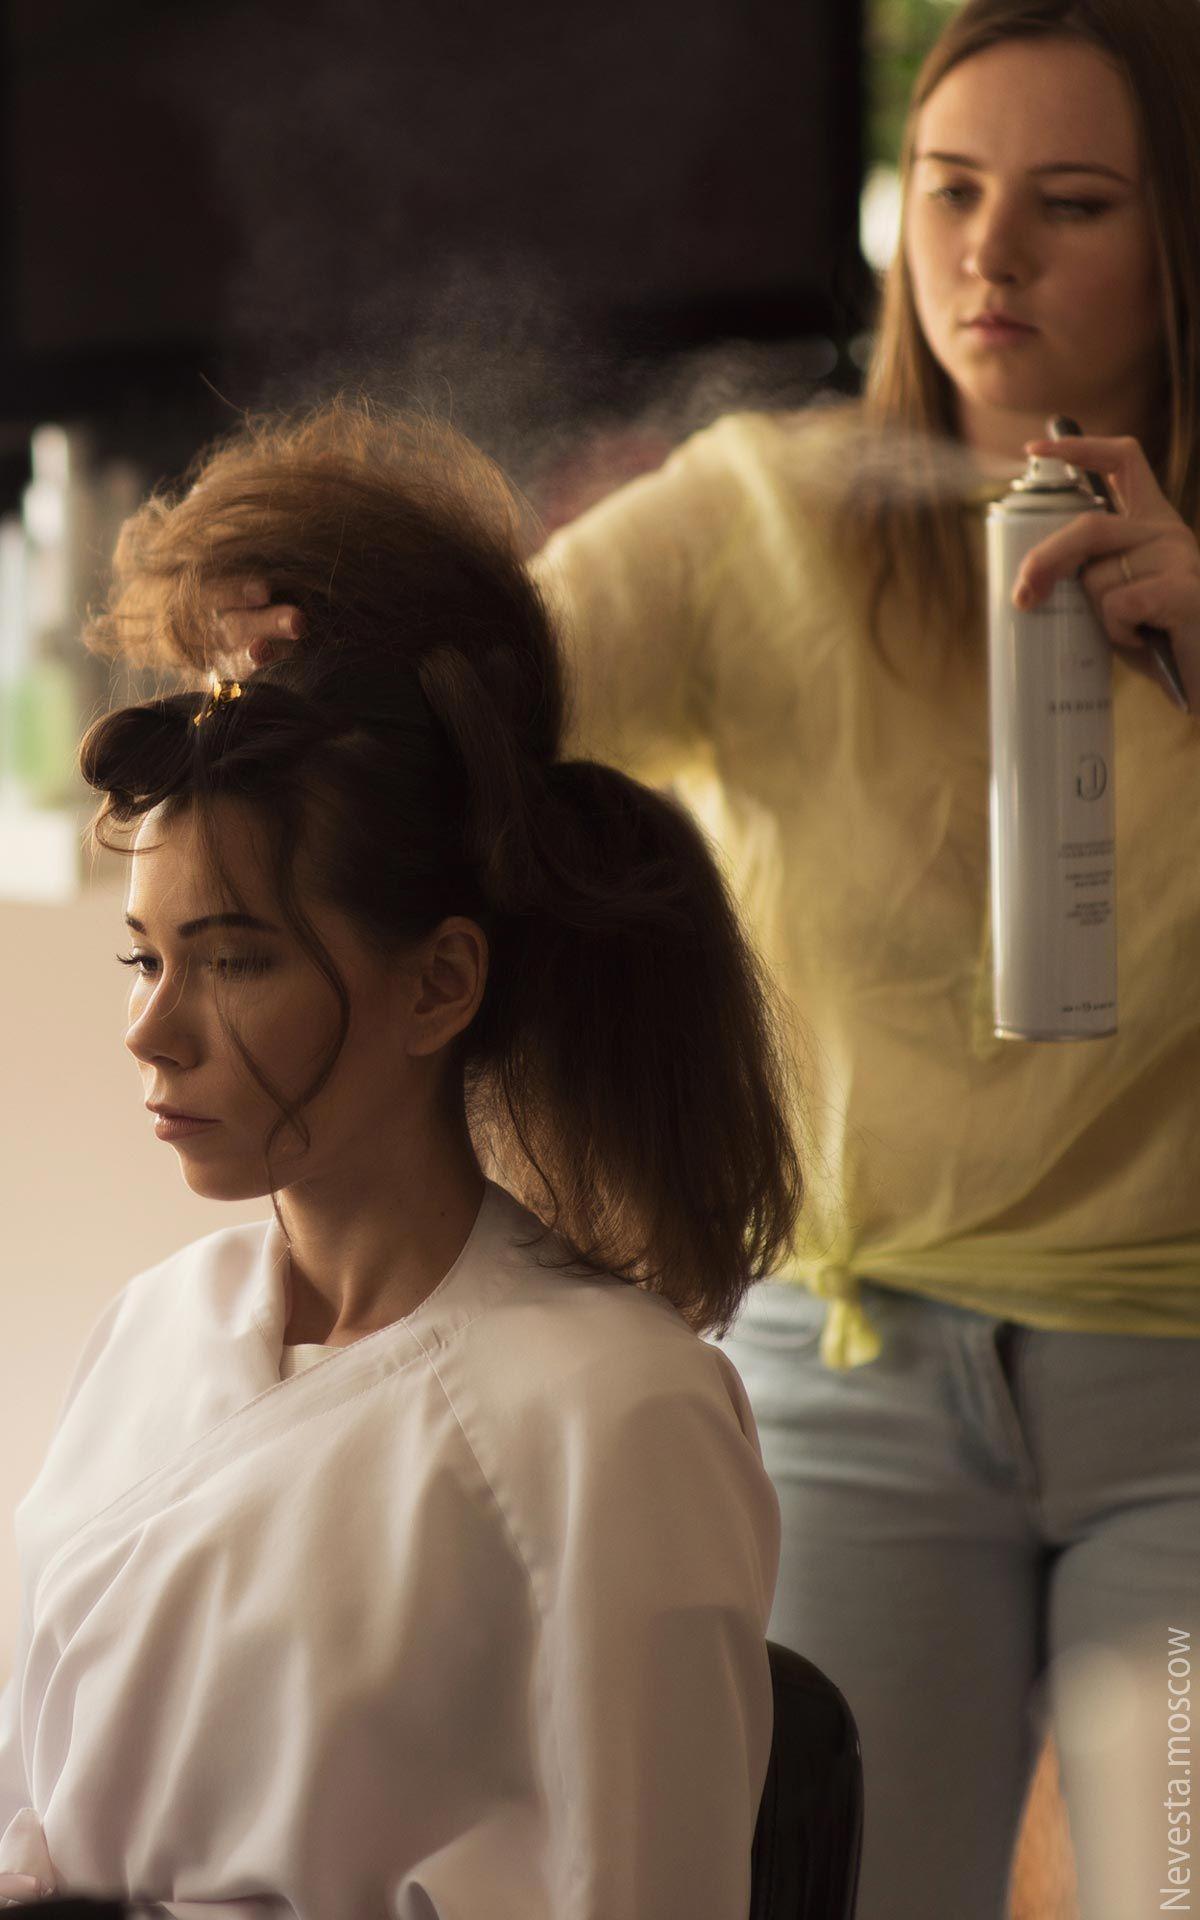 Бант из волос: хвост или пучок?